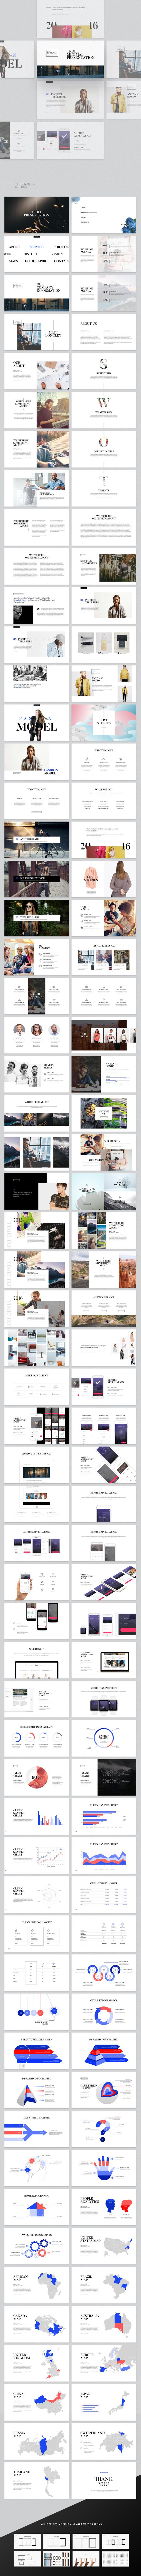 Troll-Powerpoint Template - Business PowerPoint Templates